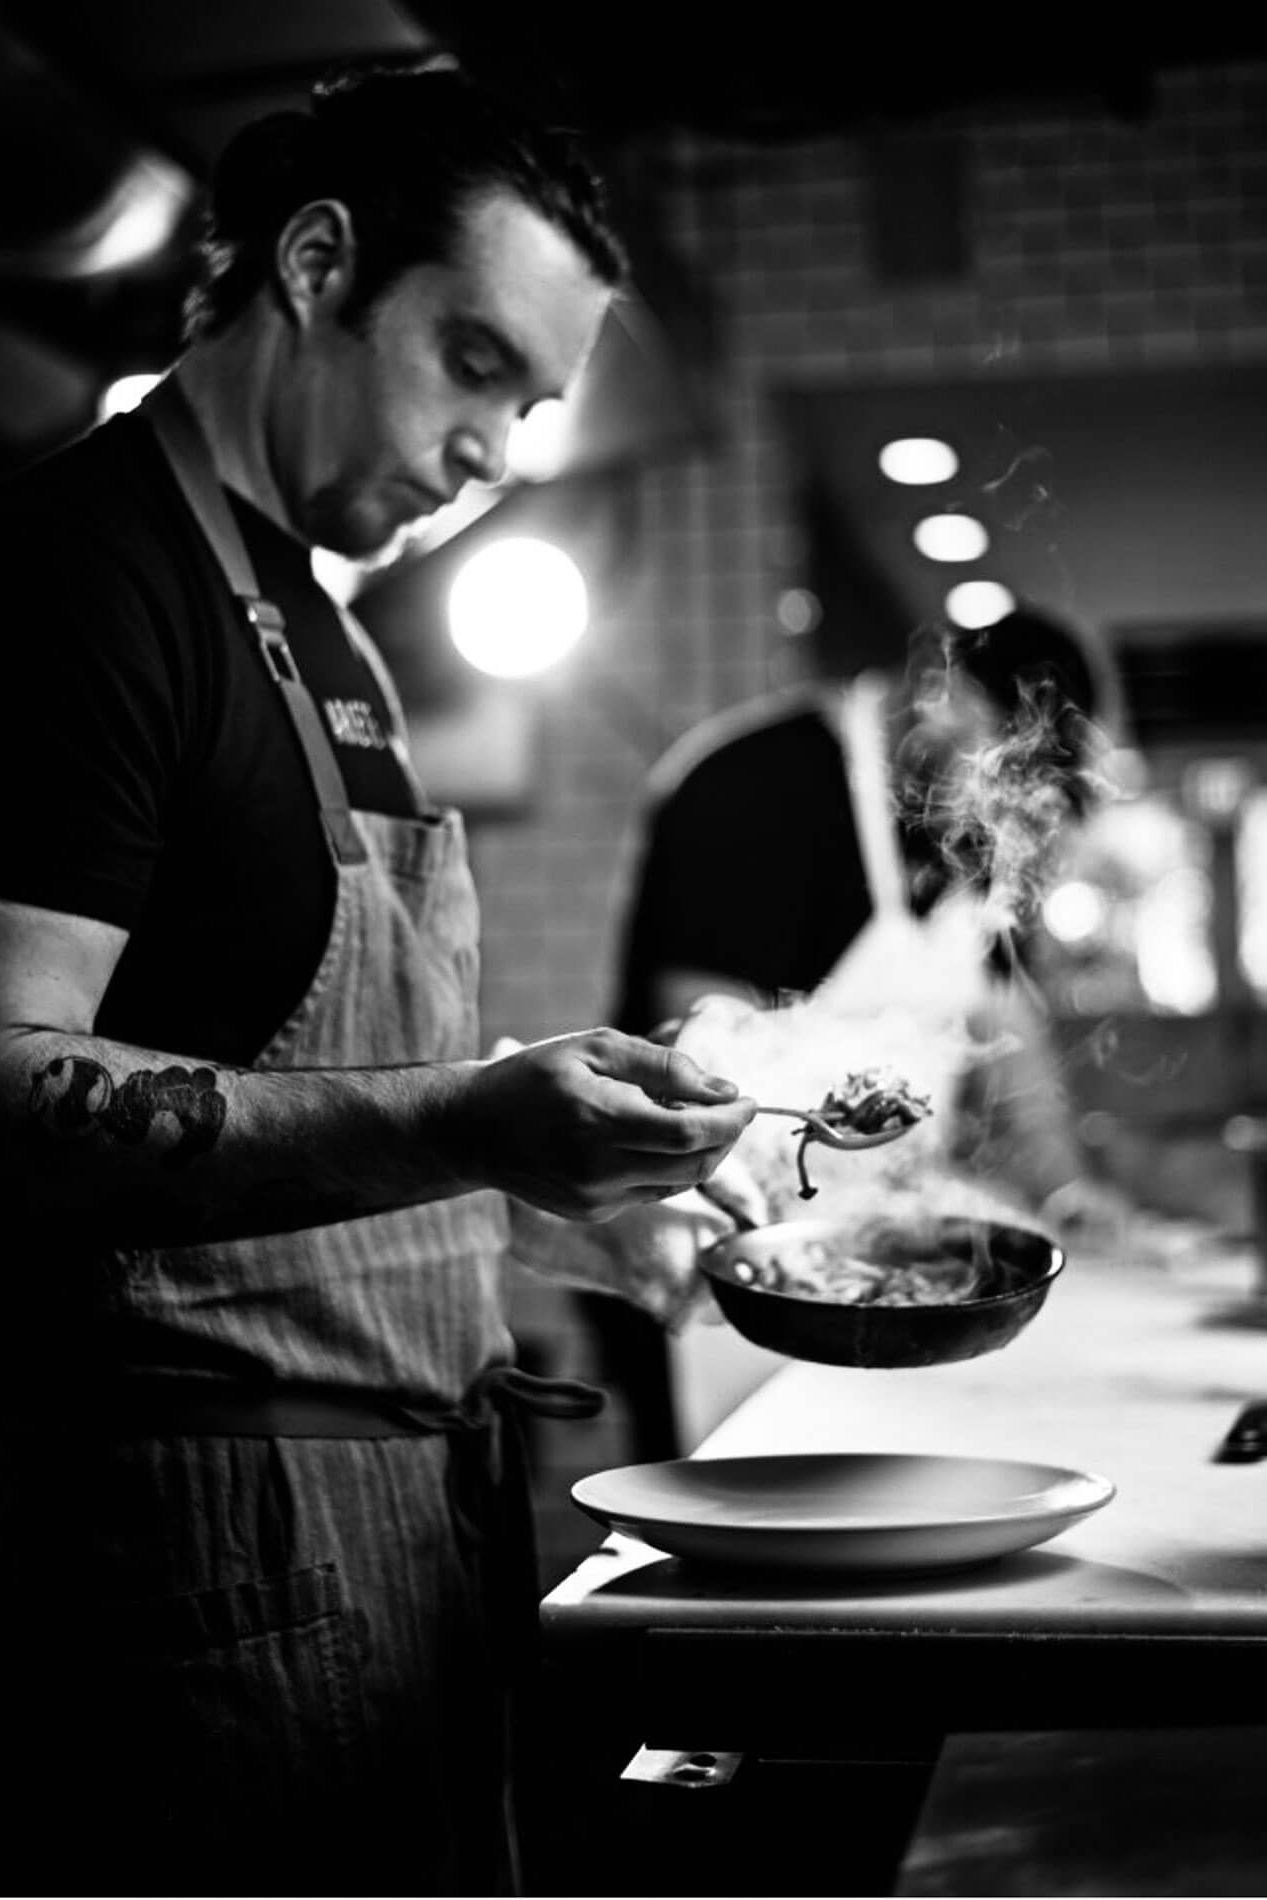 Chef Michael Beltran by James Woodley